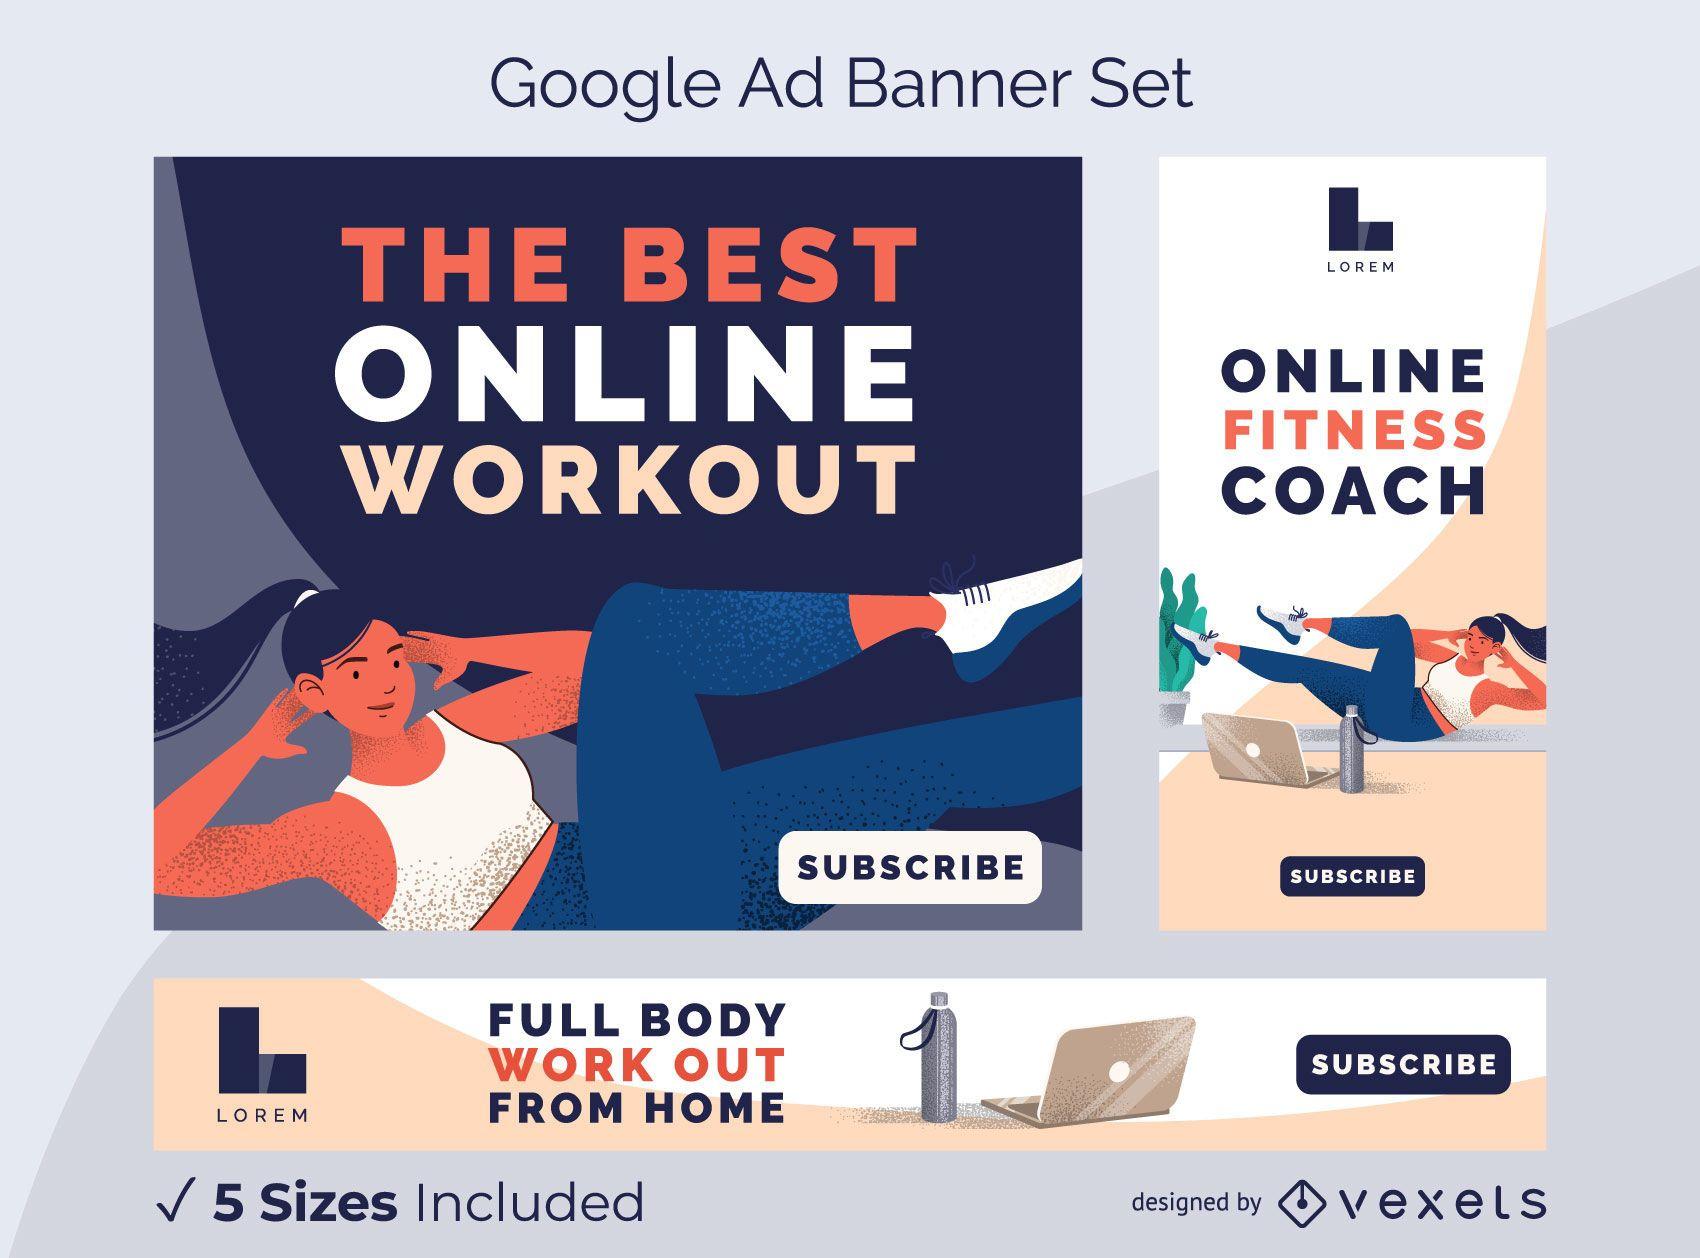 Conjunto de banners de anúncios de treino online